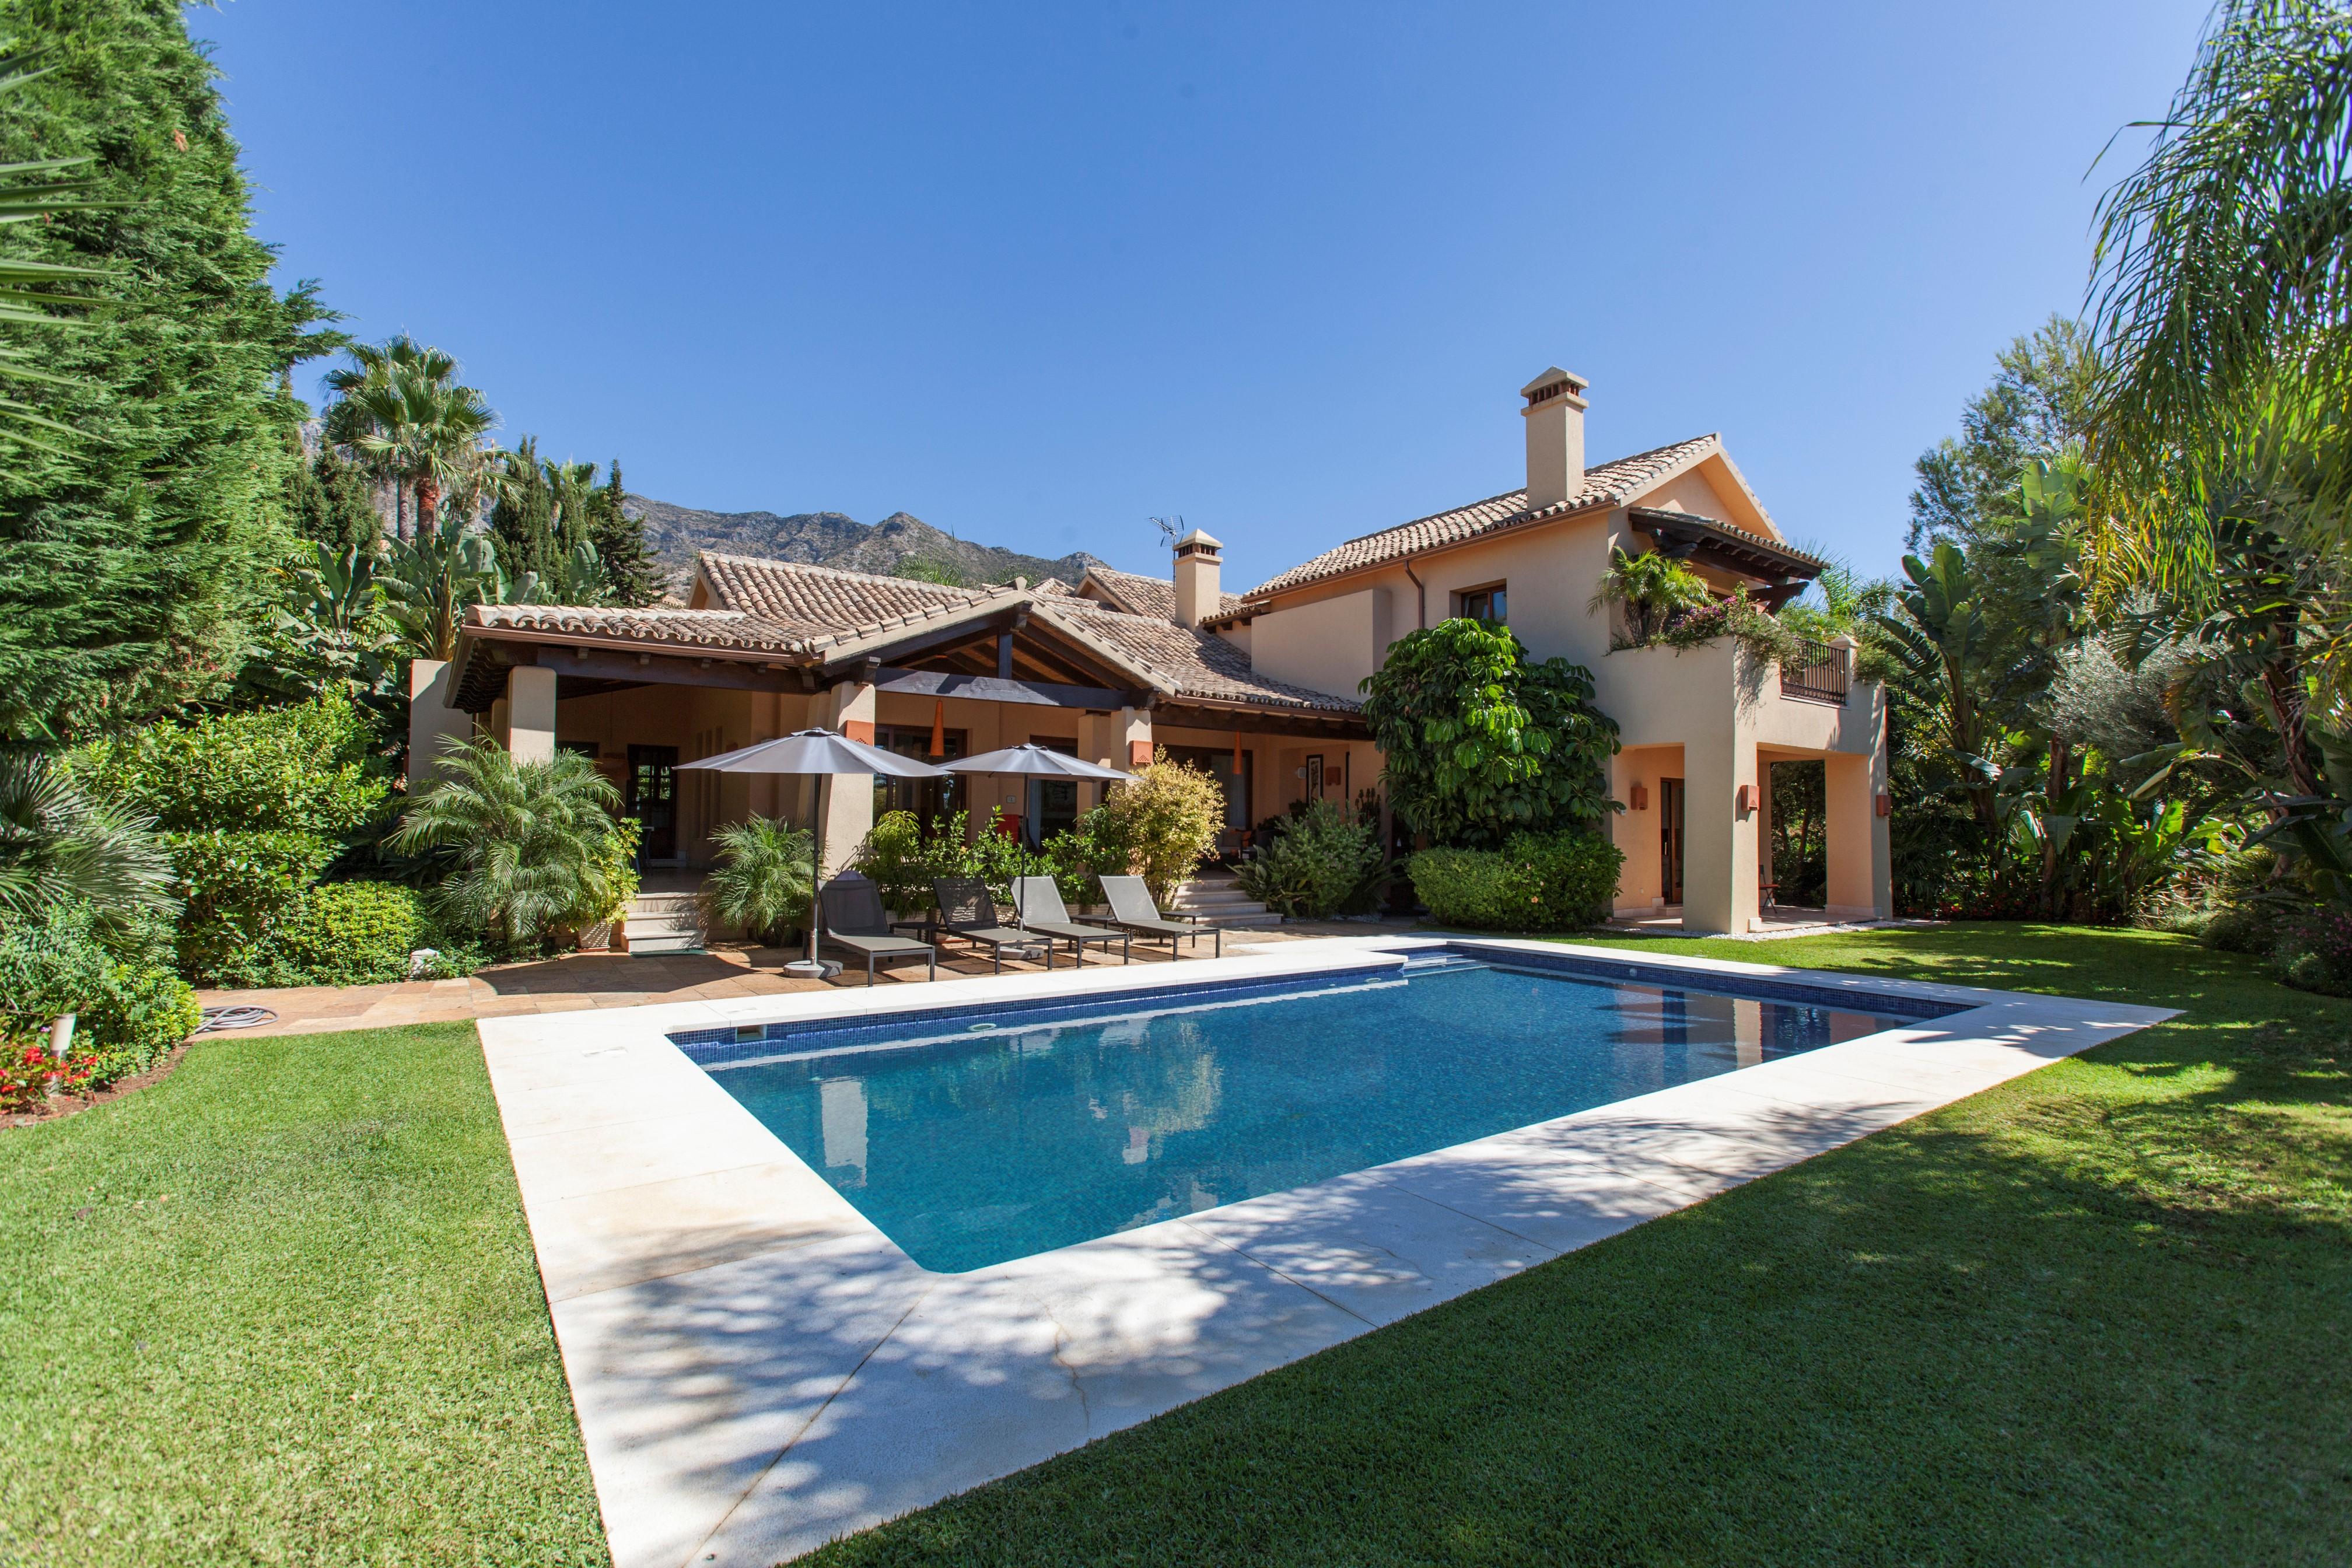 Impeccable Villa with Sea Views in Sierra Blanca 3.499.000€